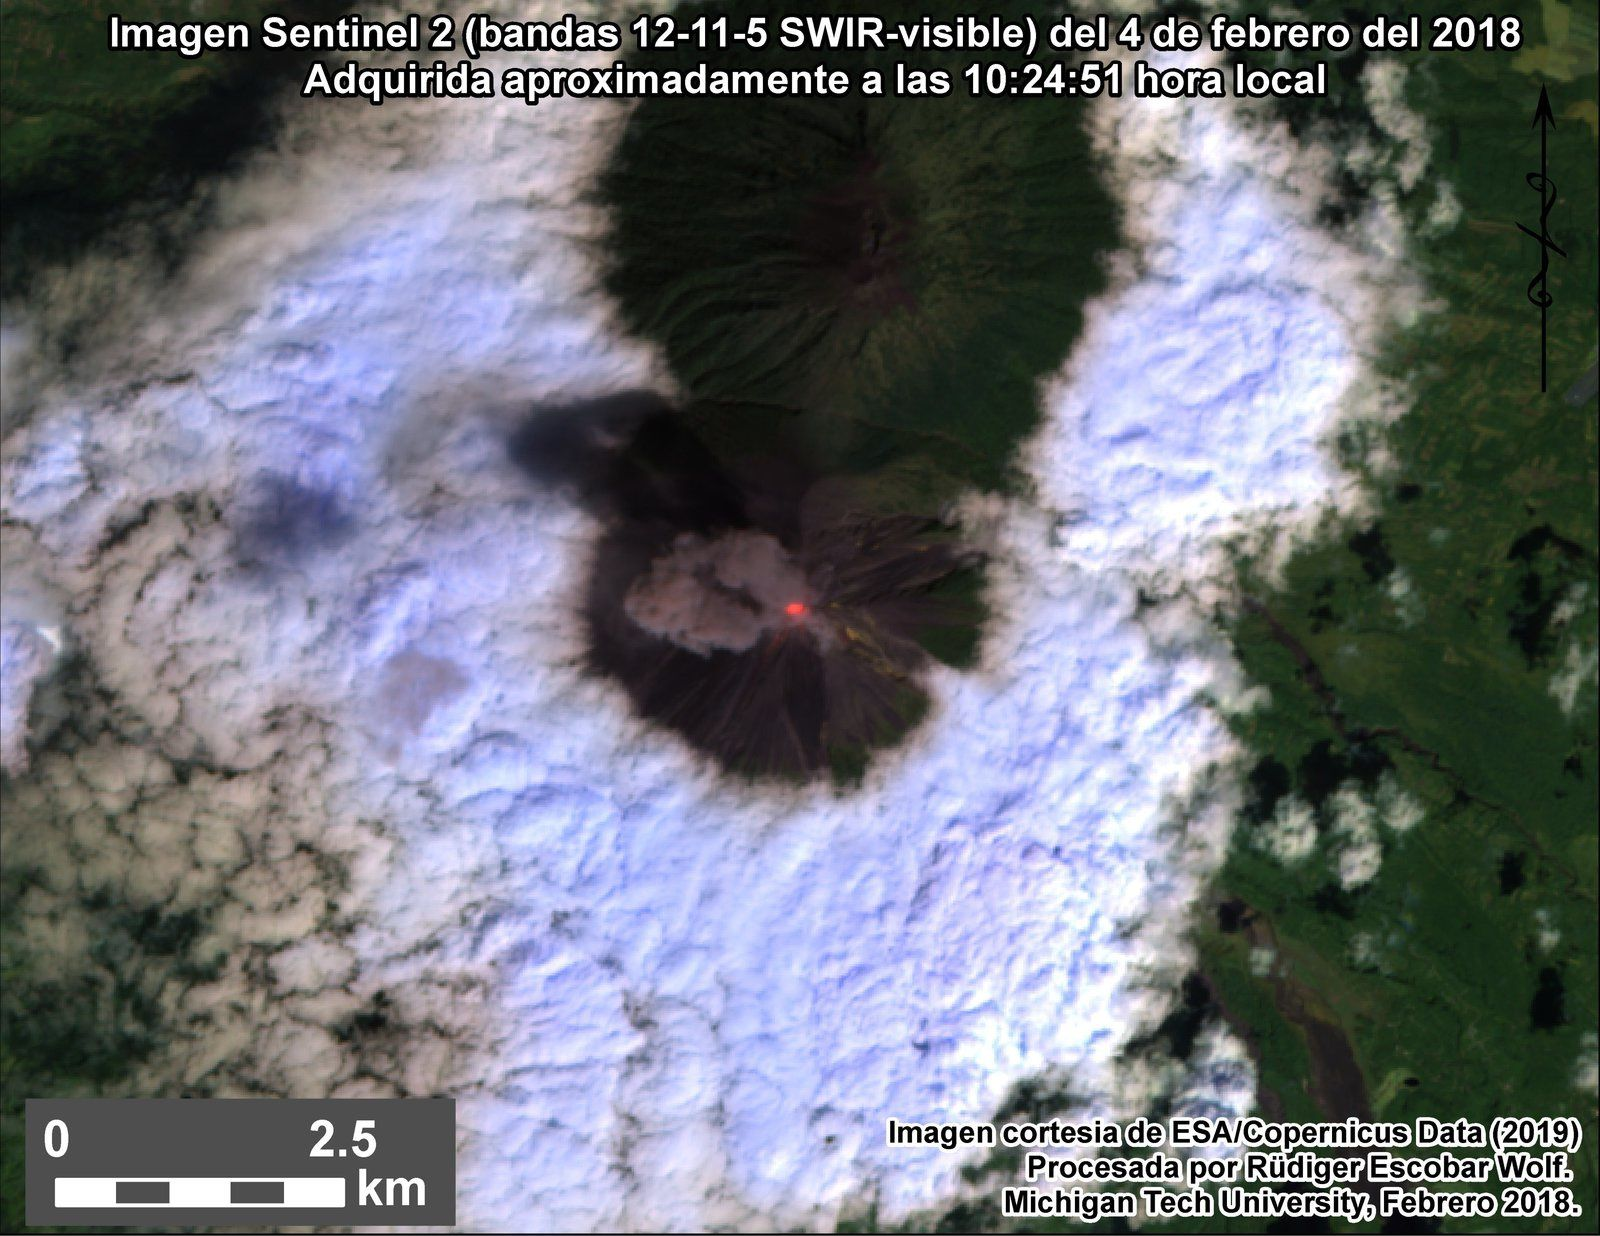 Fuego - image Sentinel 2 bands 12,11,5 SWIR-Visible from 04.02.2019 / 10:24 am - via Rüdiger Escobar Wolf